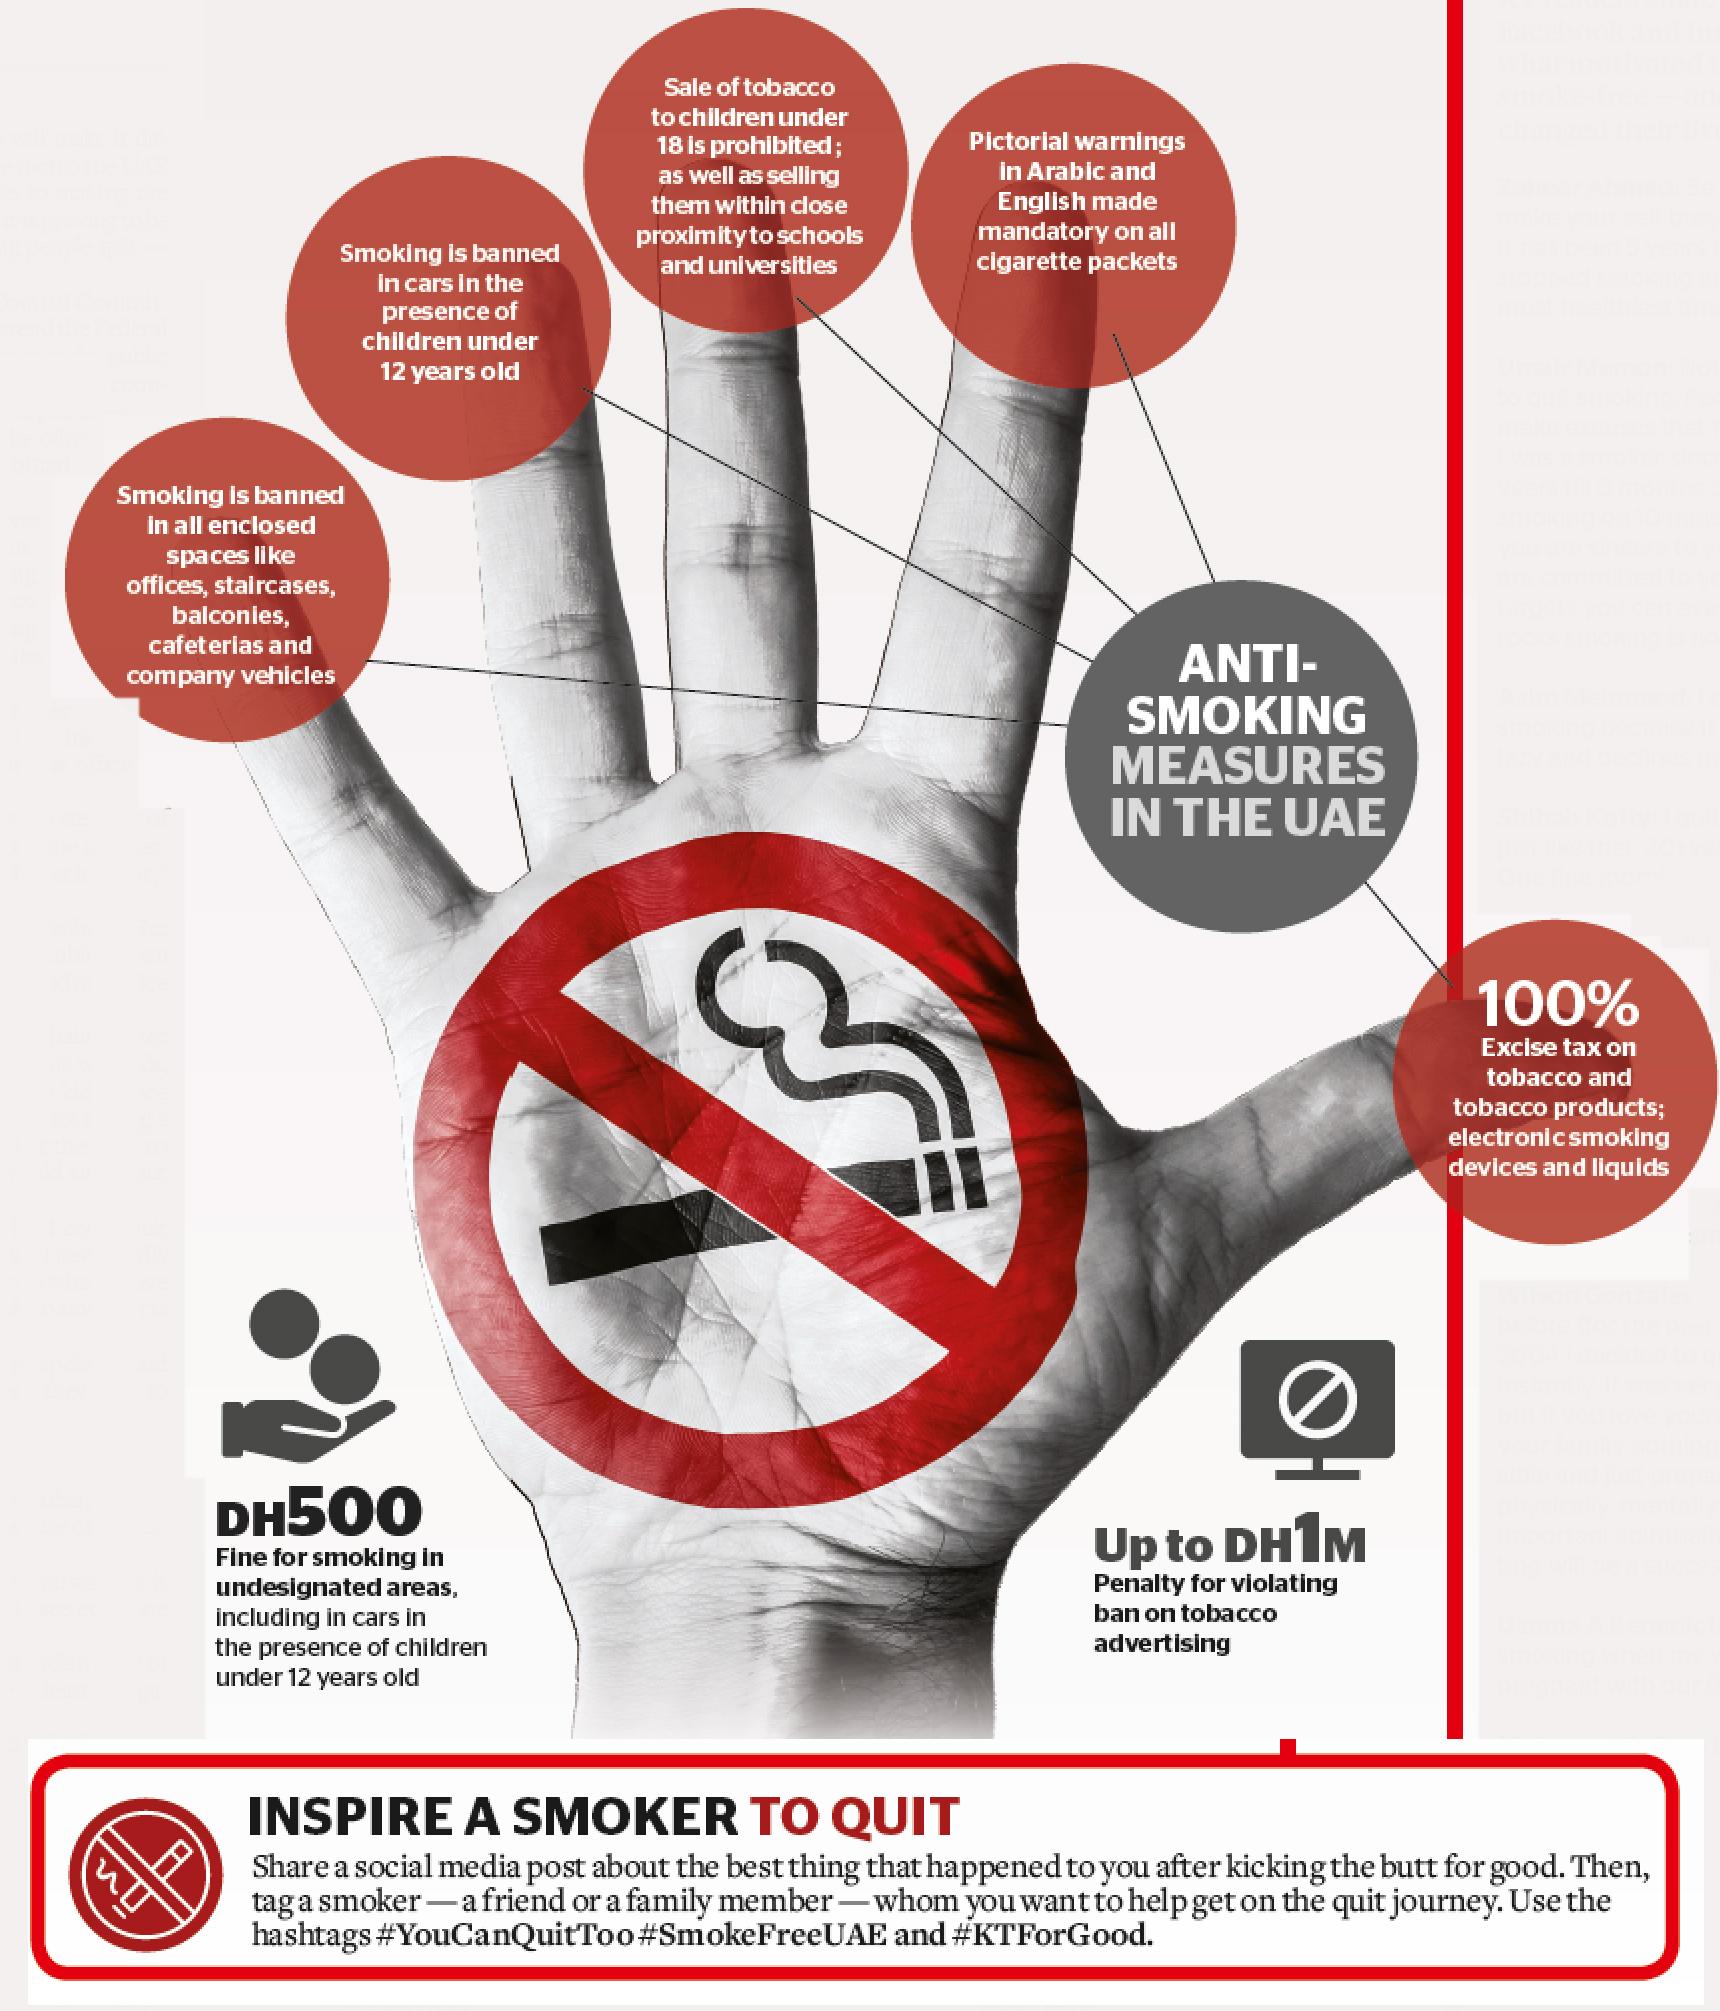 KT for Good: How UAE makes smokers go from '25 sticks to zero' (https://pbs.twimg.com/media/EPQd5vxXkAEPqlU?format=jpg&name=large)